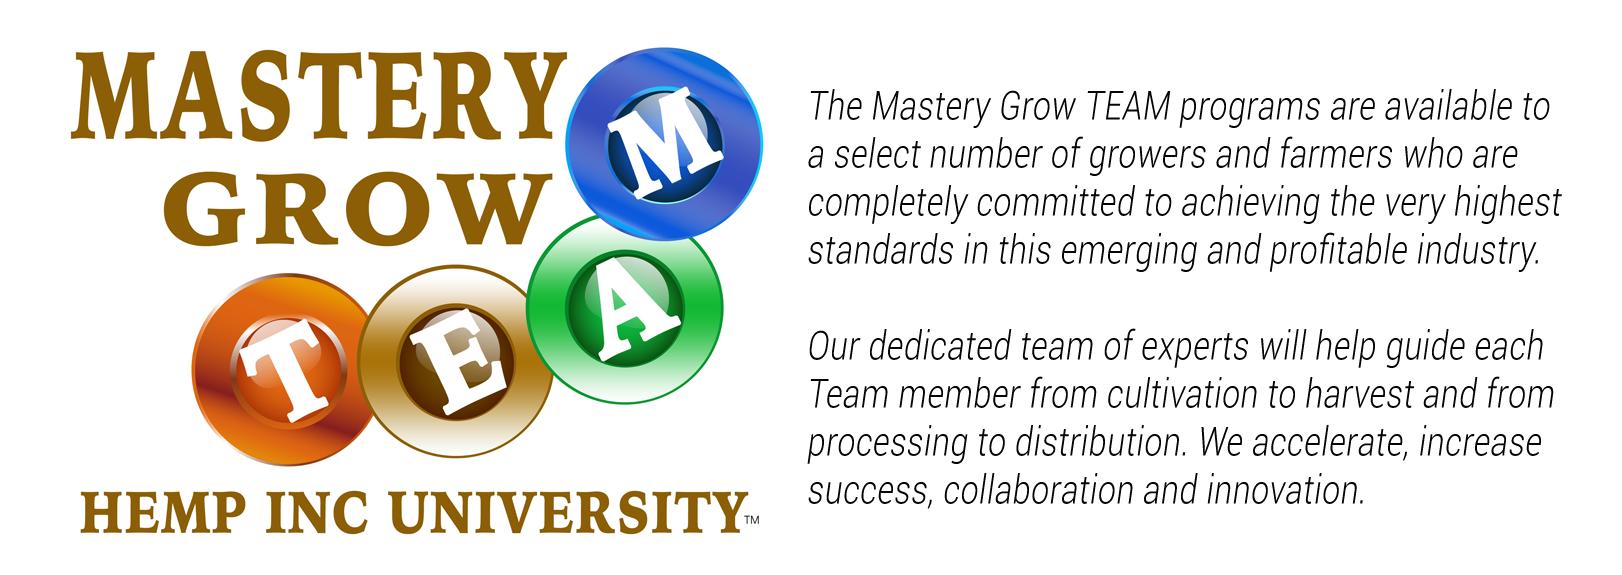 Char Mastery Gorw Team